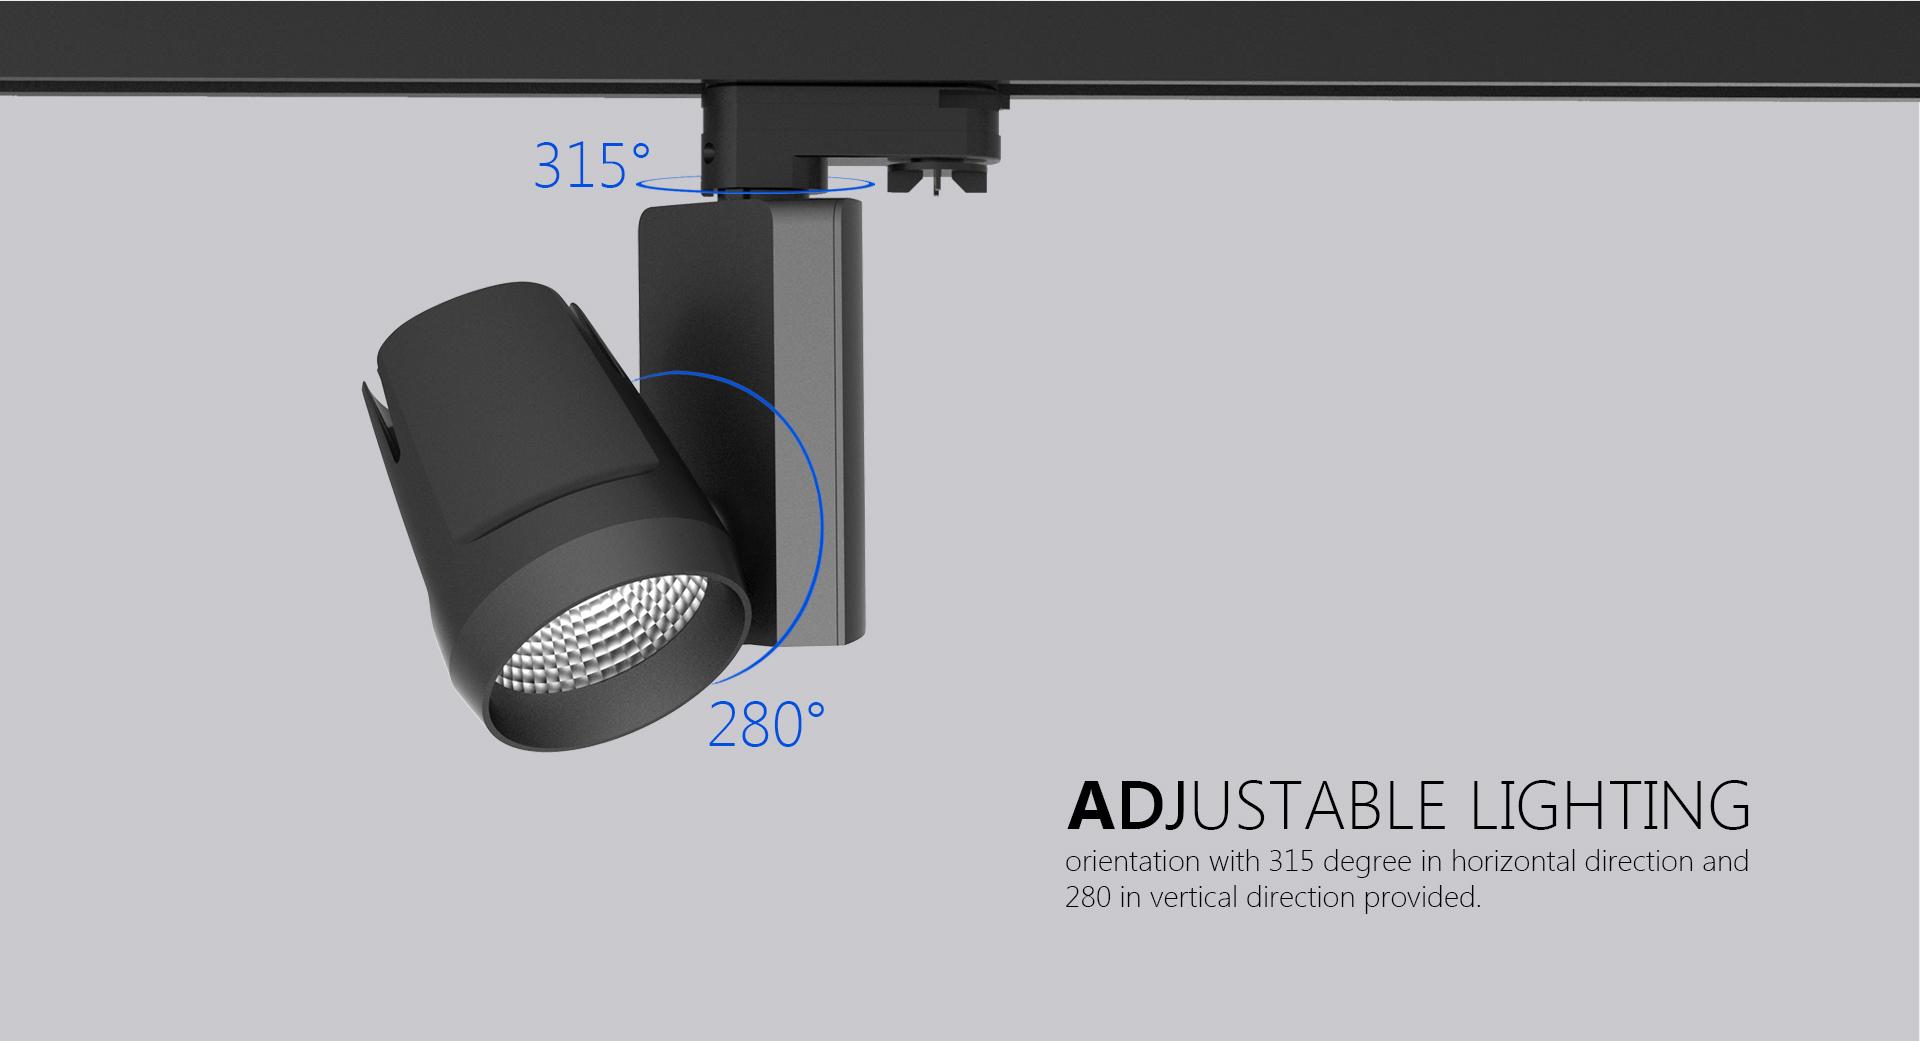 Tl25 led track light upshine lighting adjustable led track lighting03 aloadofball Images